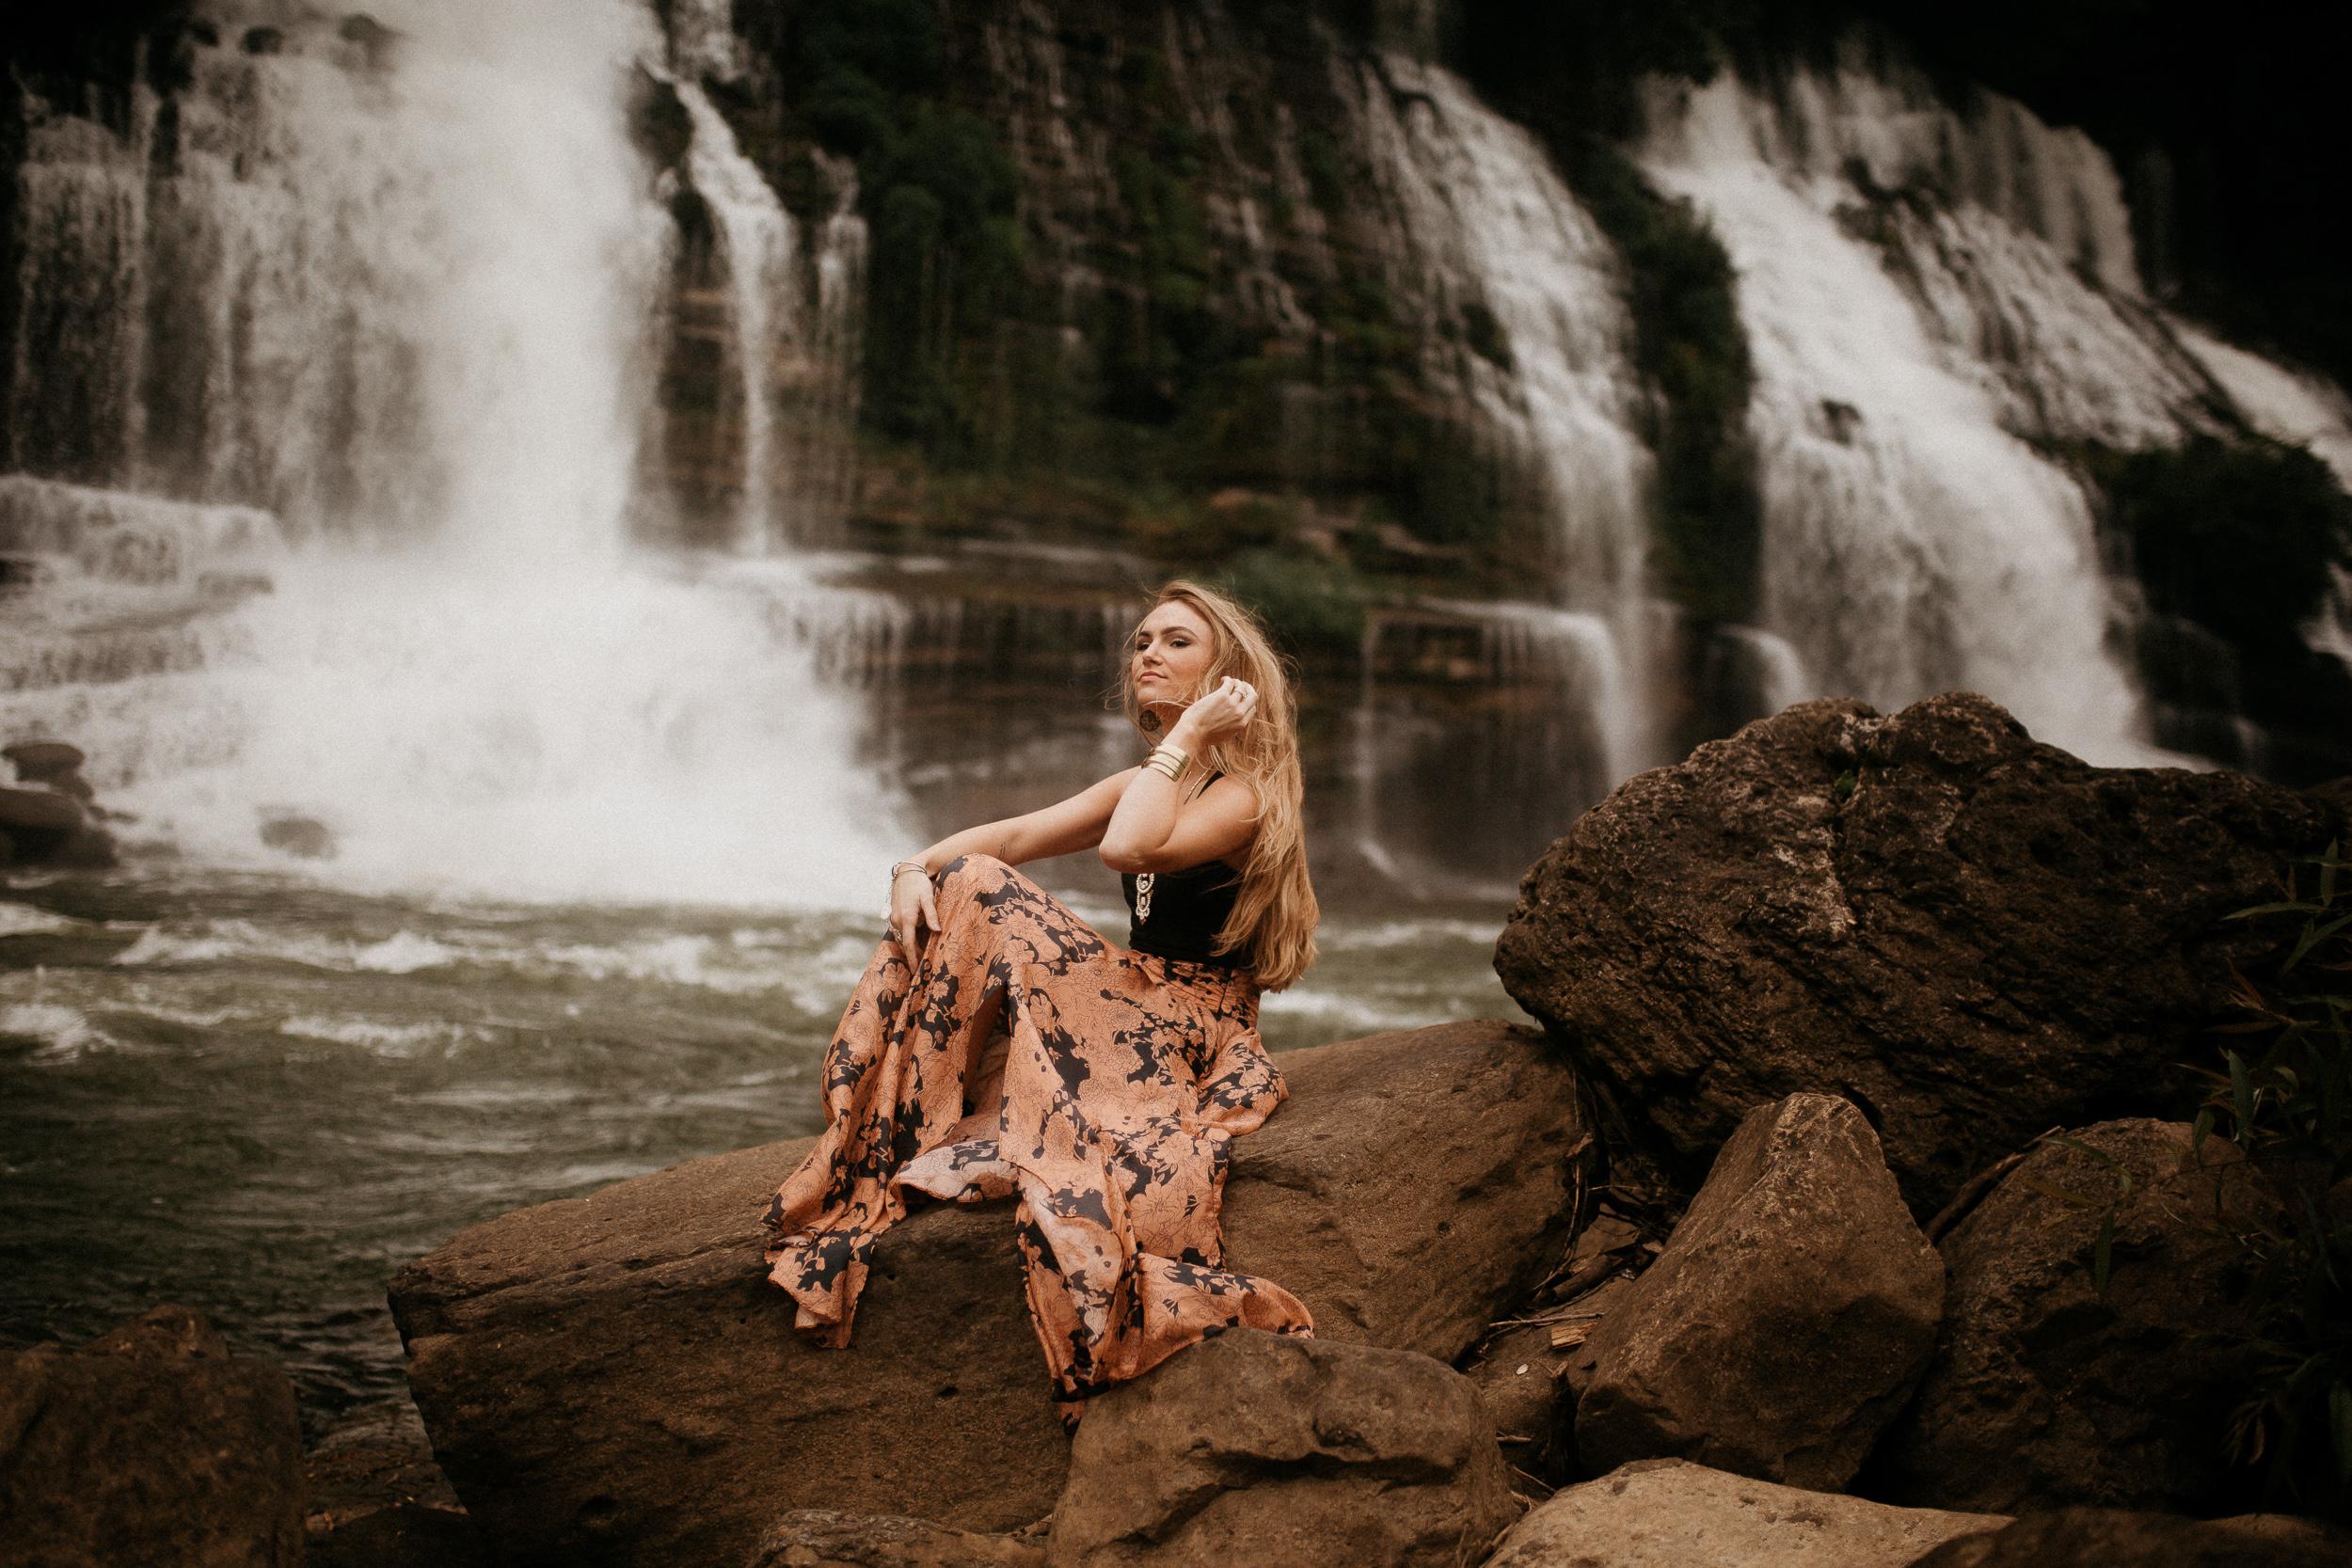 memphis-gatlinburg-nashville-tennessee-wedding-photographer-the-hatches-utah-colorado-washington-arizona-oregon-yosemite-national-park-elopement-adventure-emotional-journalistic-bohemian-florals-minimalistic-winery-elegant-timeless-engagement-waterfall